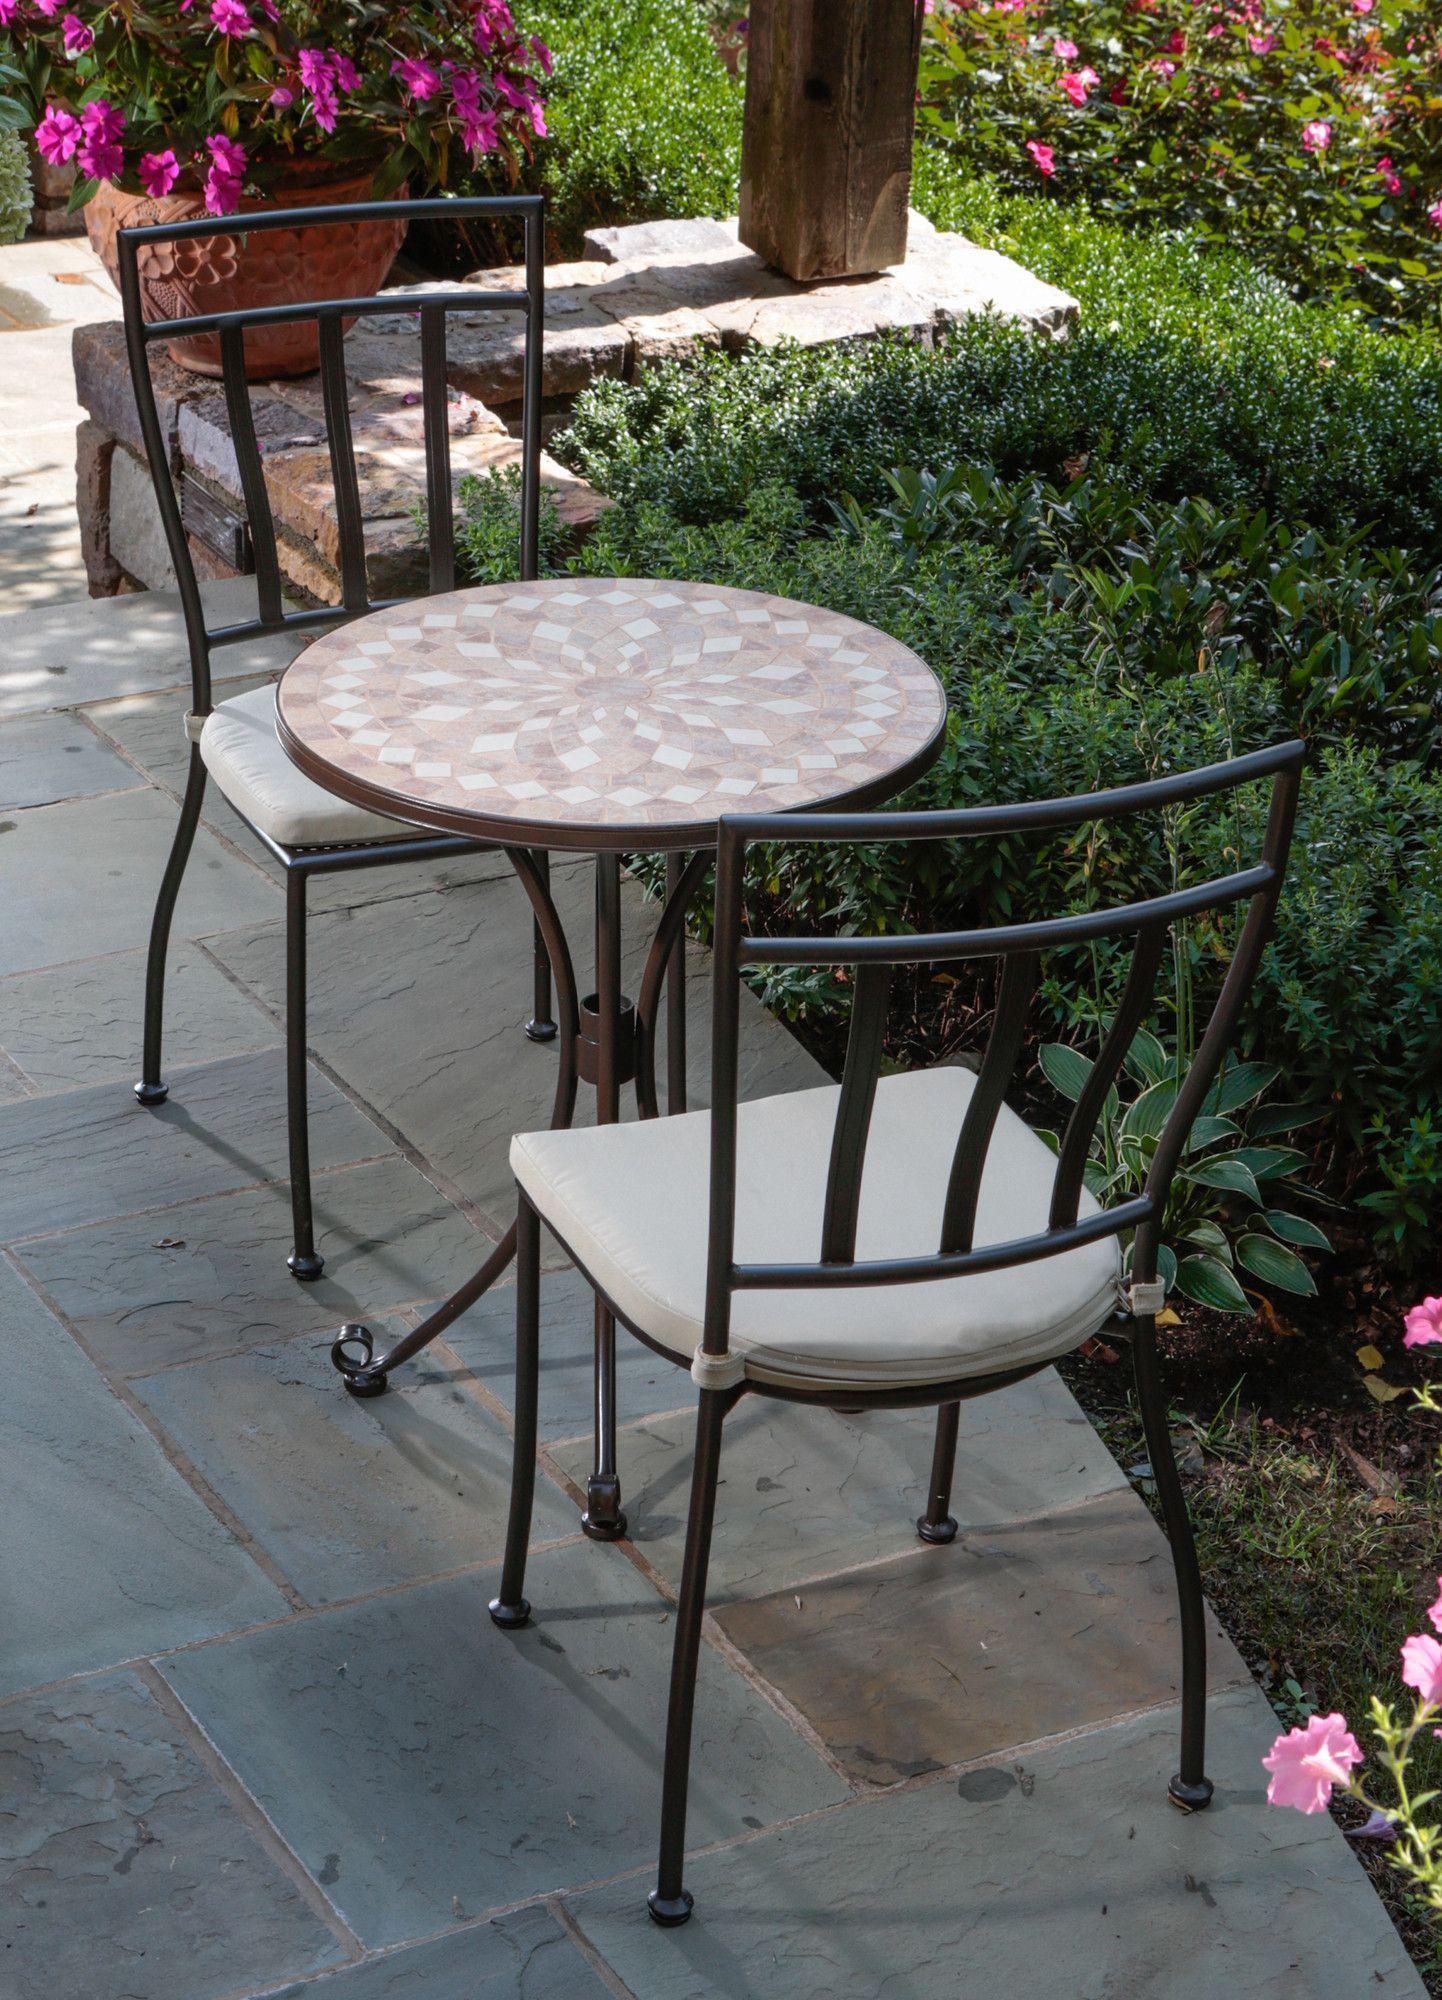 Cilento Mosaic Bistro Set | Bistro set, Patio dining set ... on Belham Living Wrought Iron Bar Height Bistro Set By Woodard id=51163